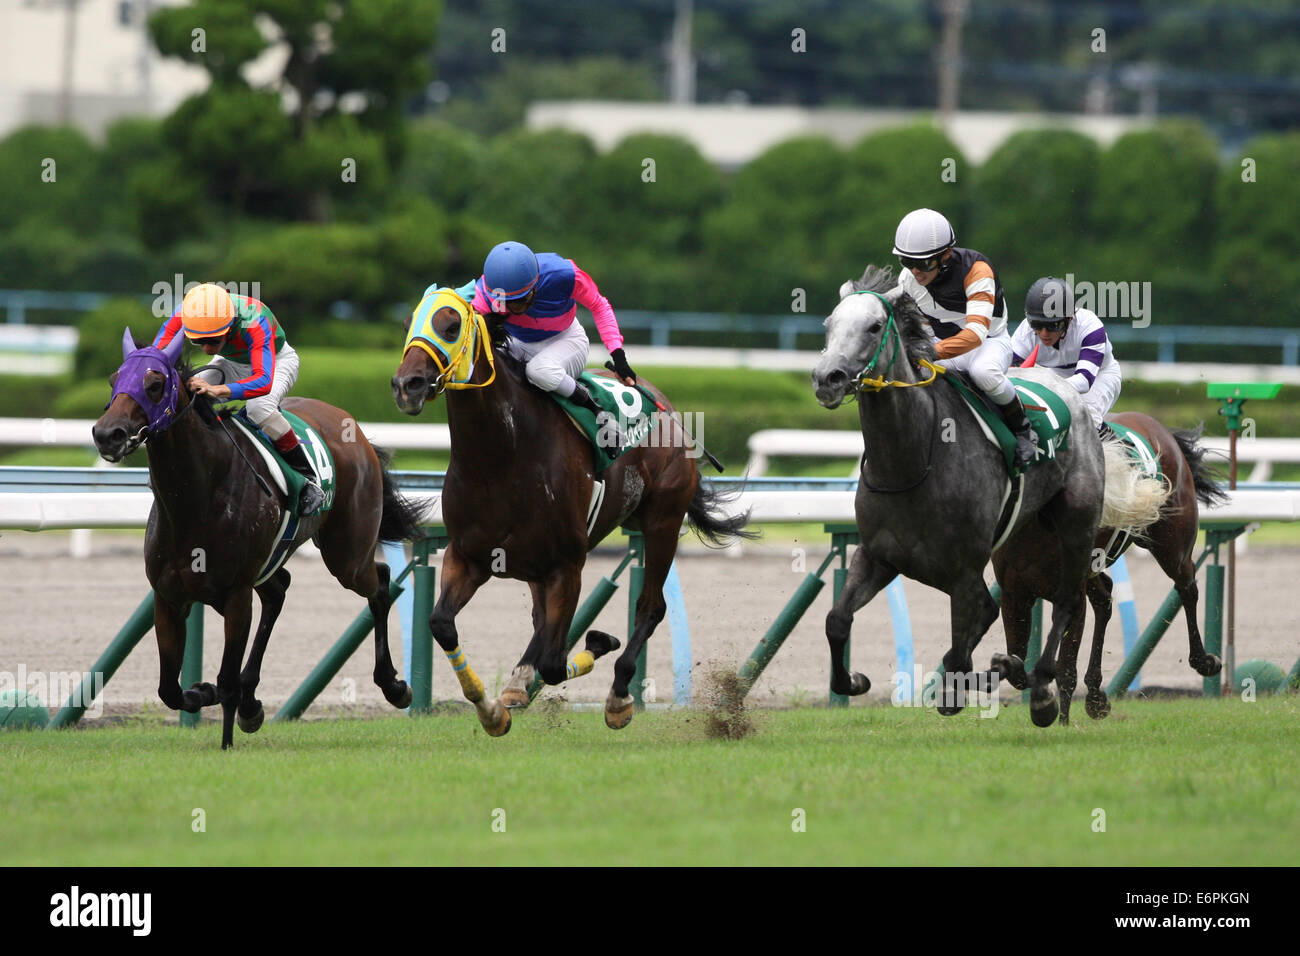 Fukuoka, Japan. 24th Aug, 2014. (L-R) Am Ball Bleiben (Ken Tanaka), Meisho Izayoi (Keisuke Dazai), Little Gerda - Stock Image